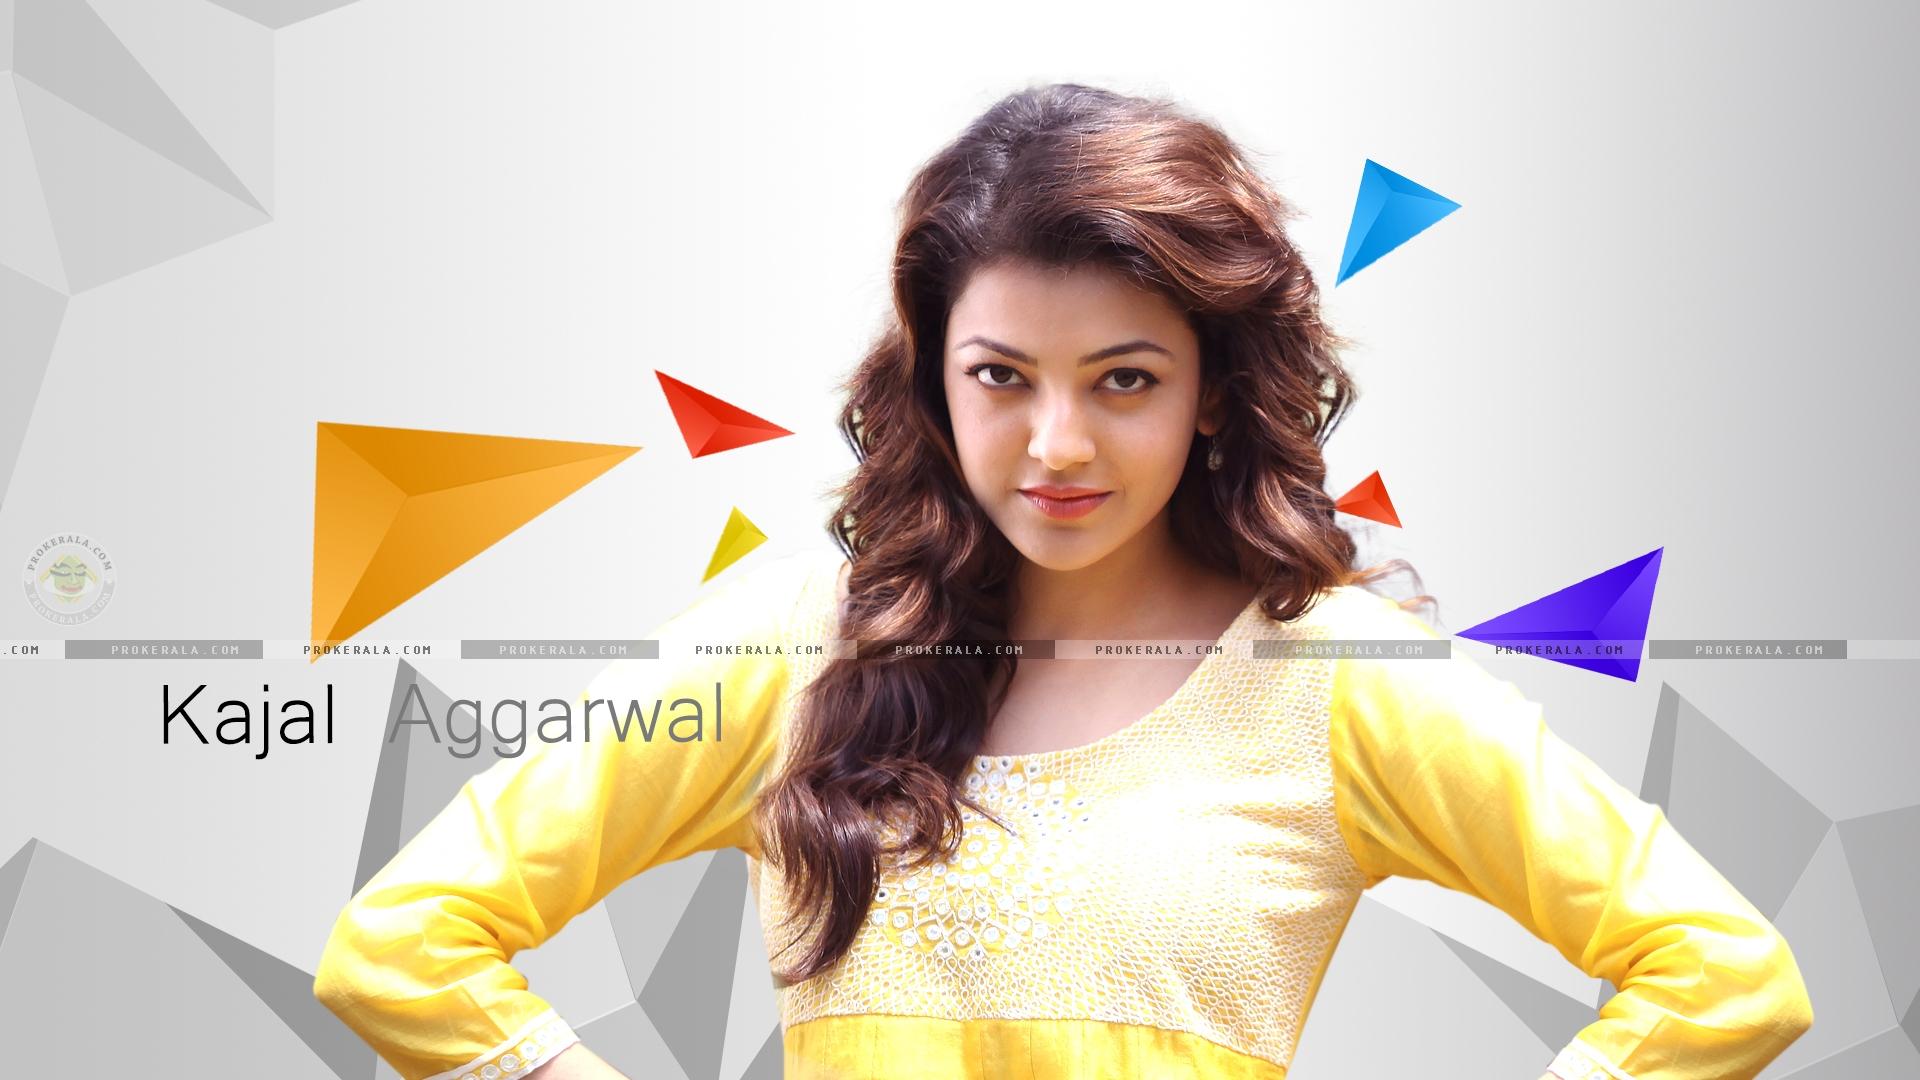 kajal aggarwal photos wallpaper hd